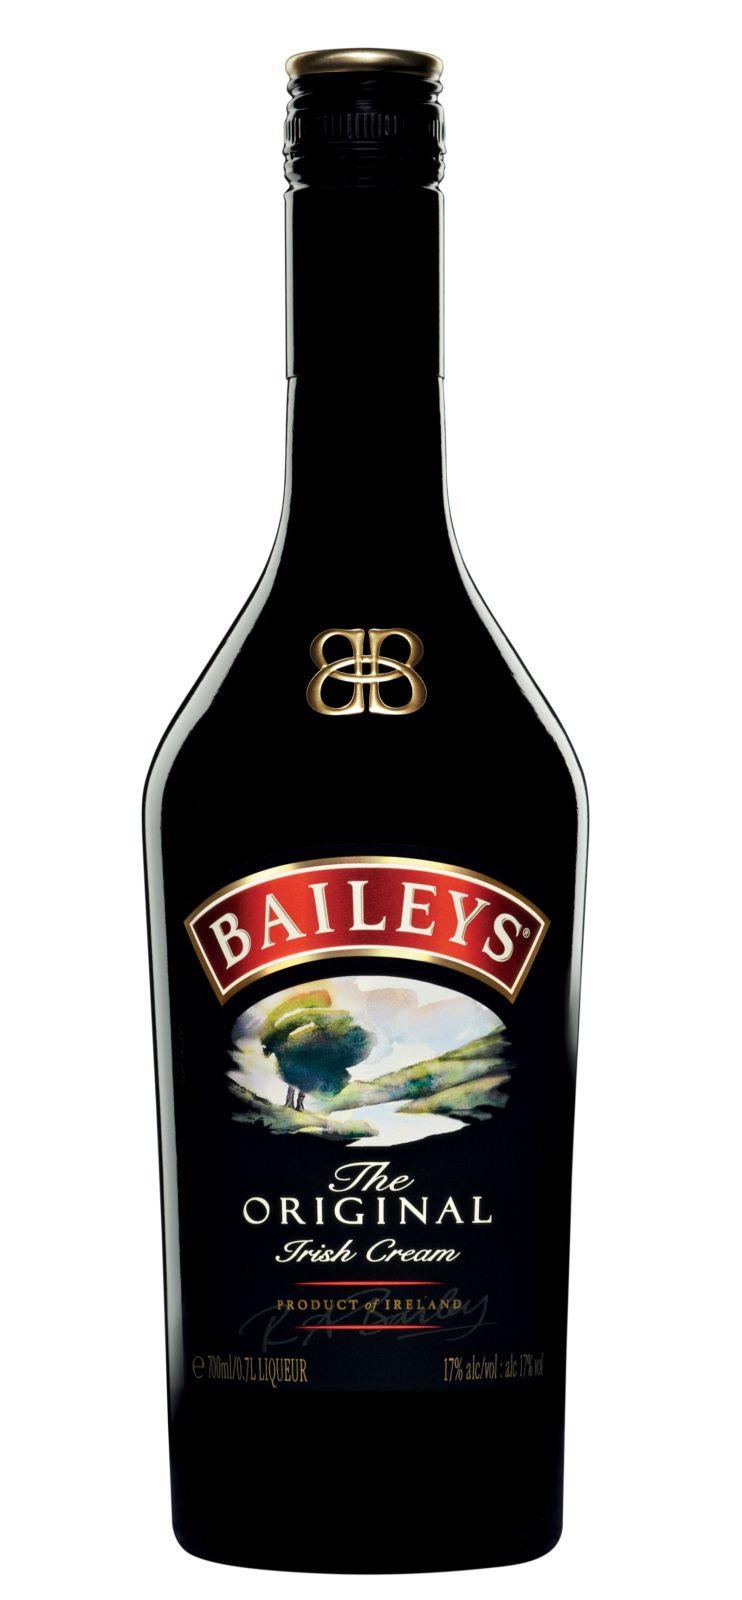 Efterstræbte Baileys Irish Cream 0,7l 17% | ALKOHOL.cz UJ-29